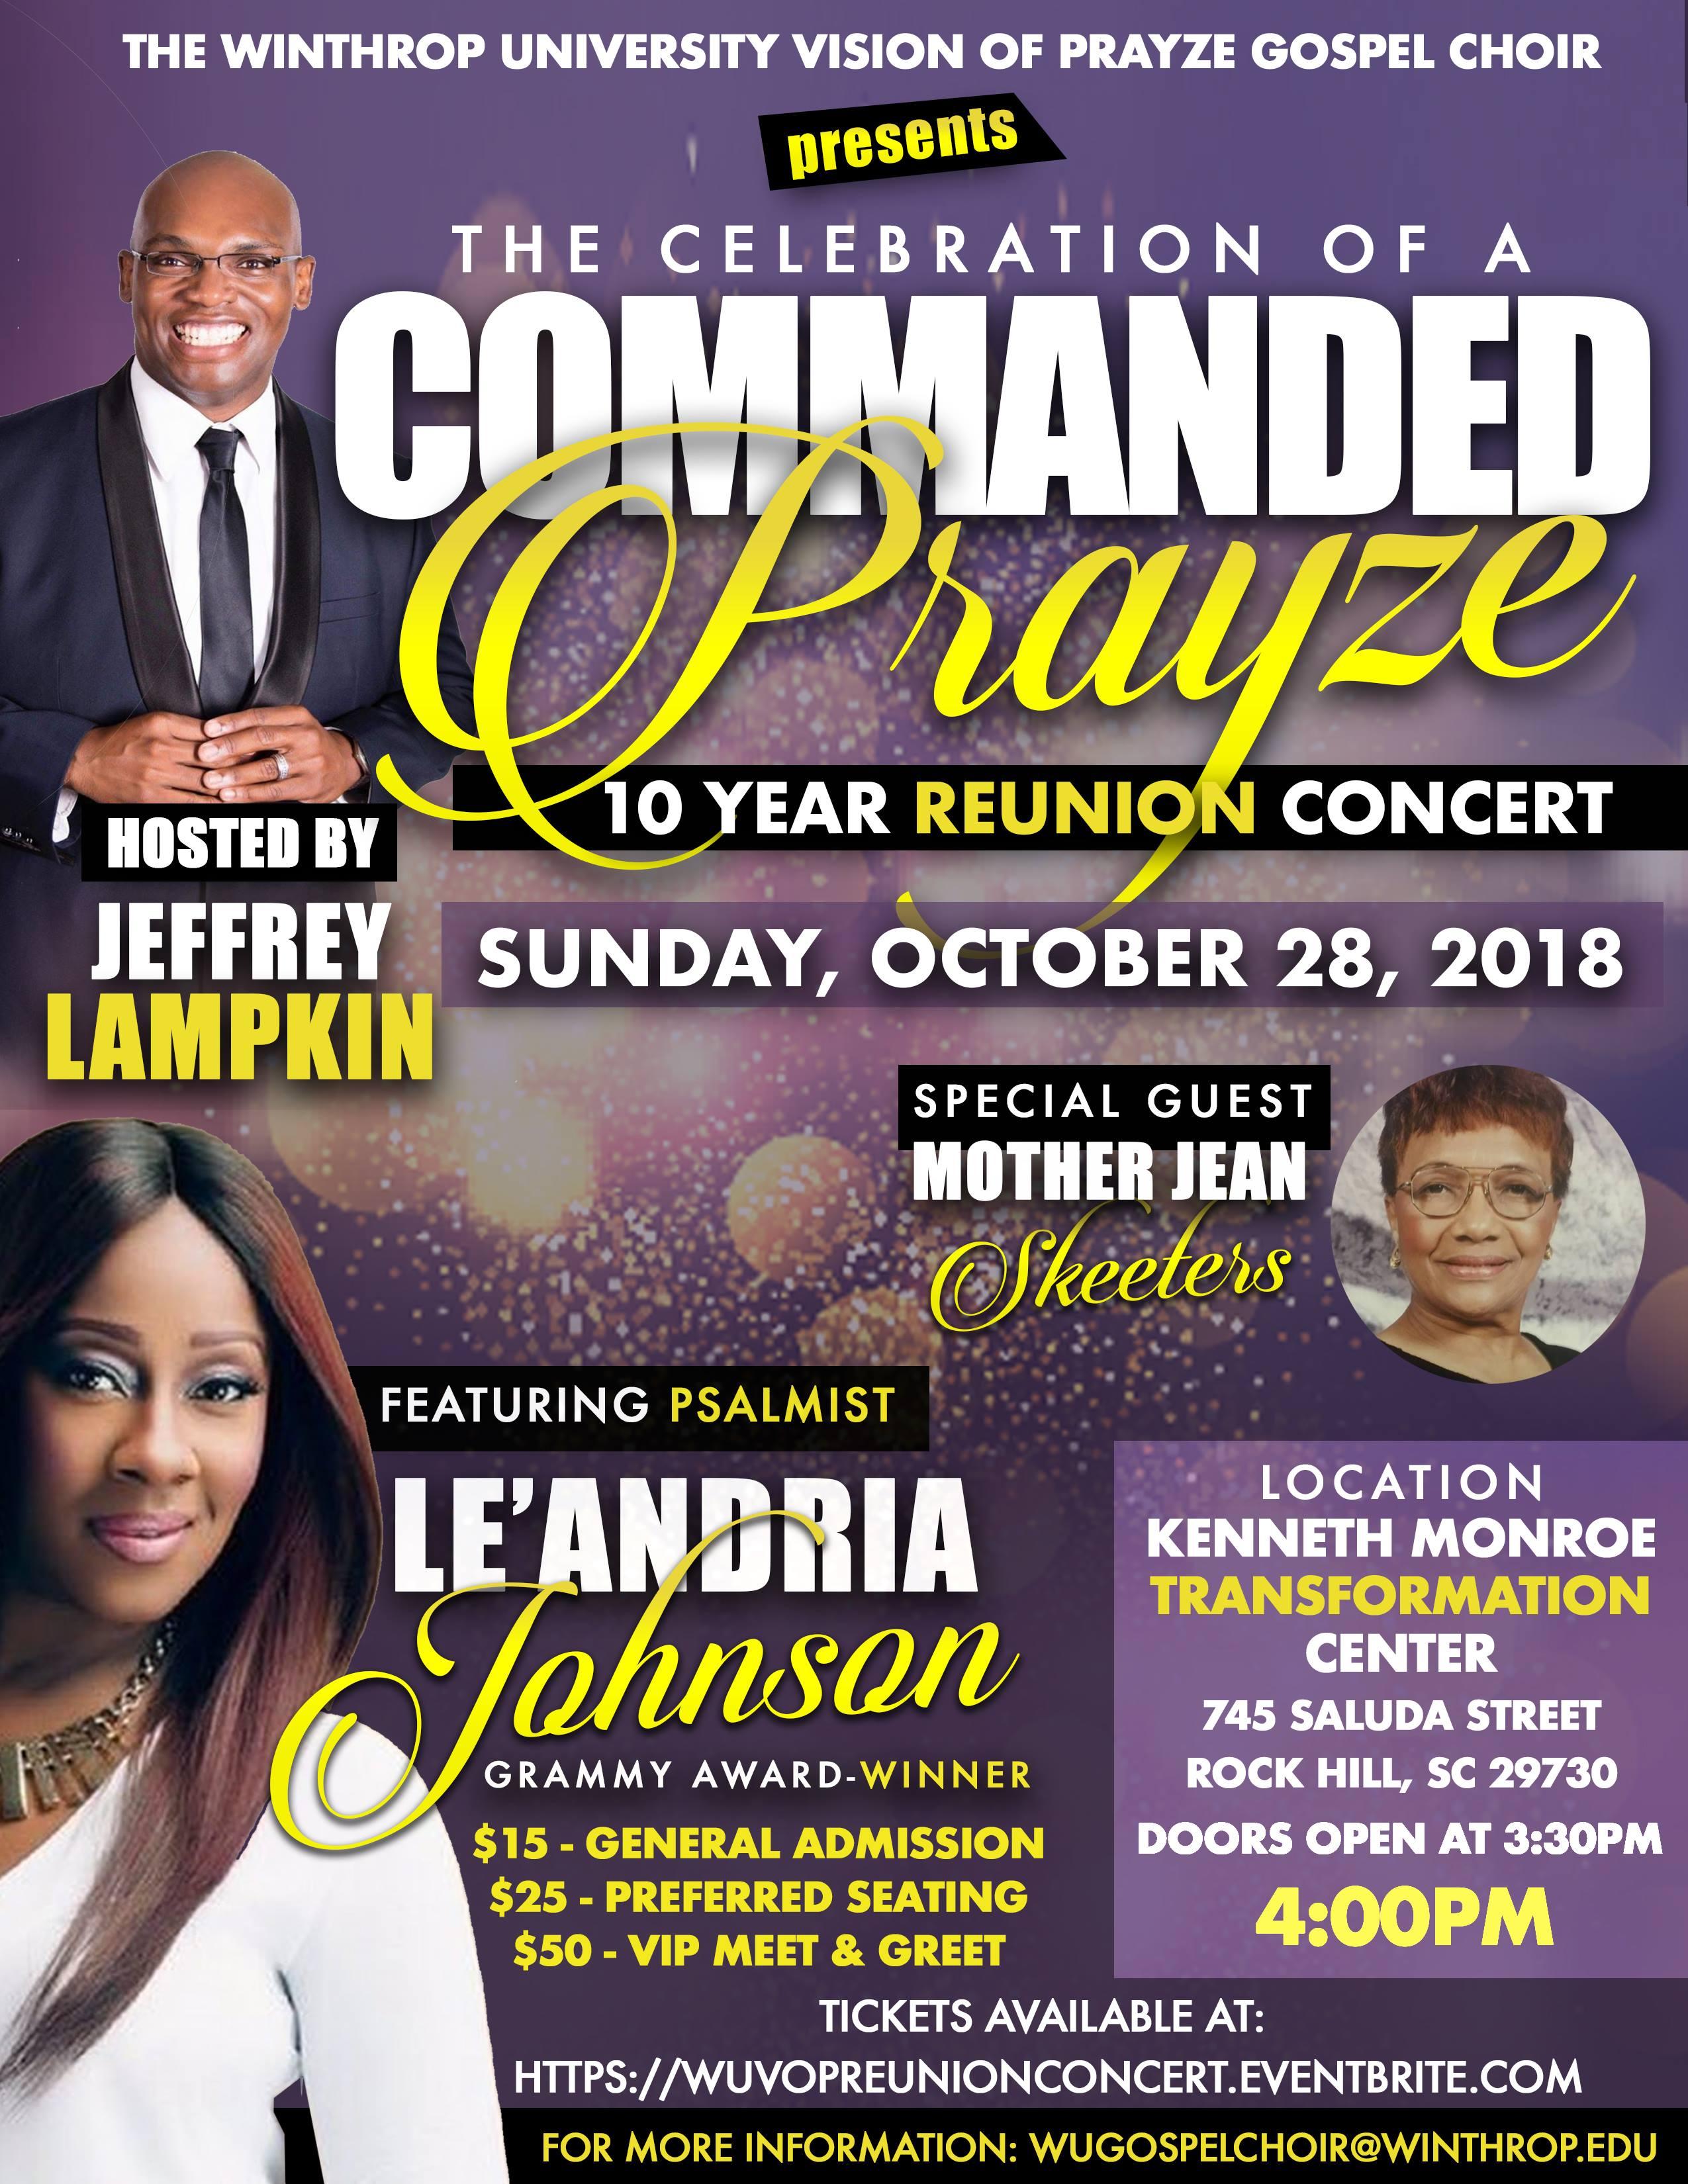 Winthrop University Gospel Choir Reunion Concert featuring Le'Andria Johnson